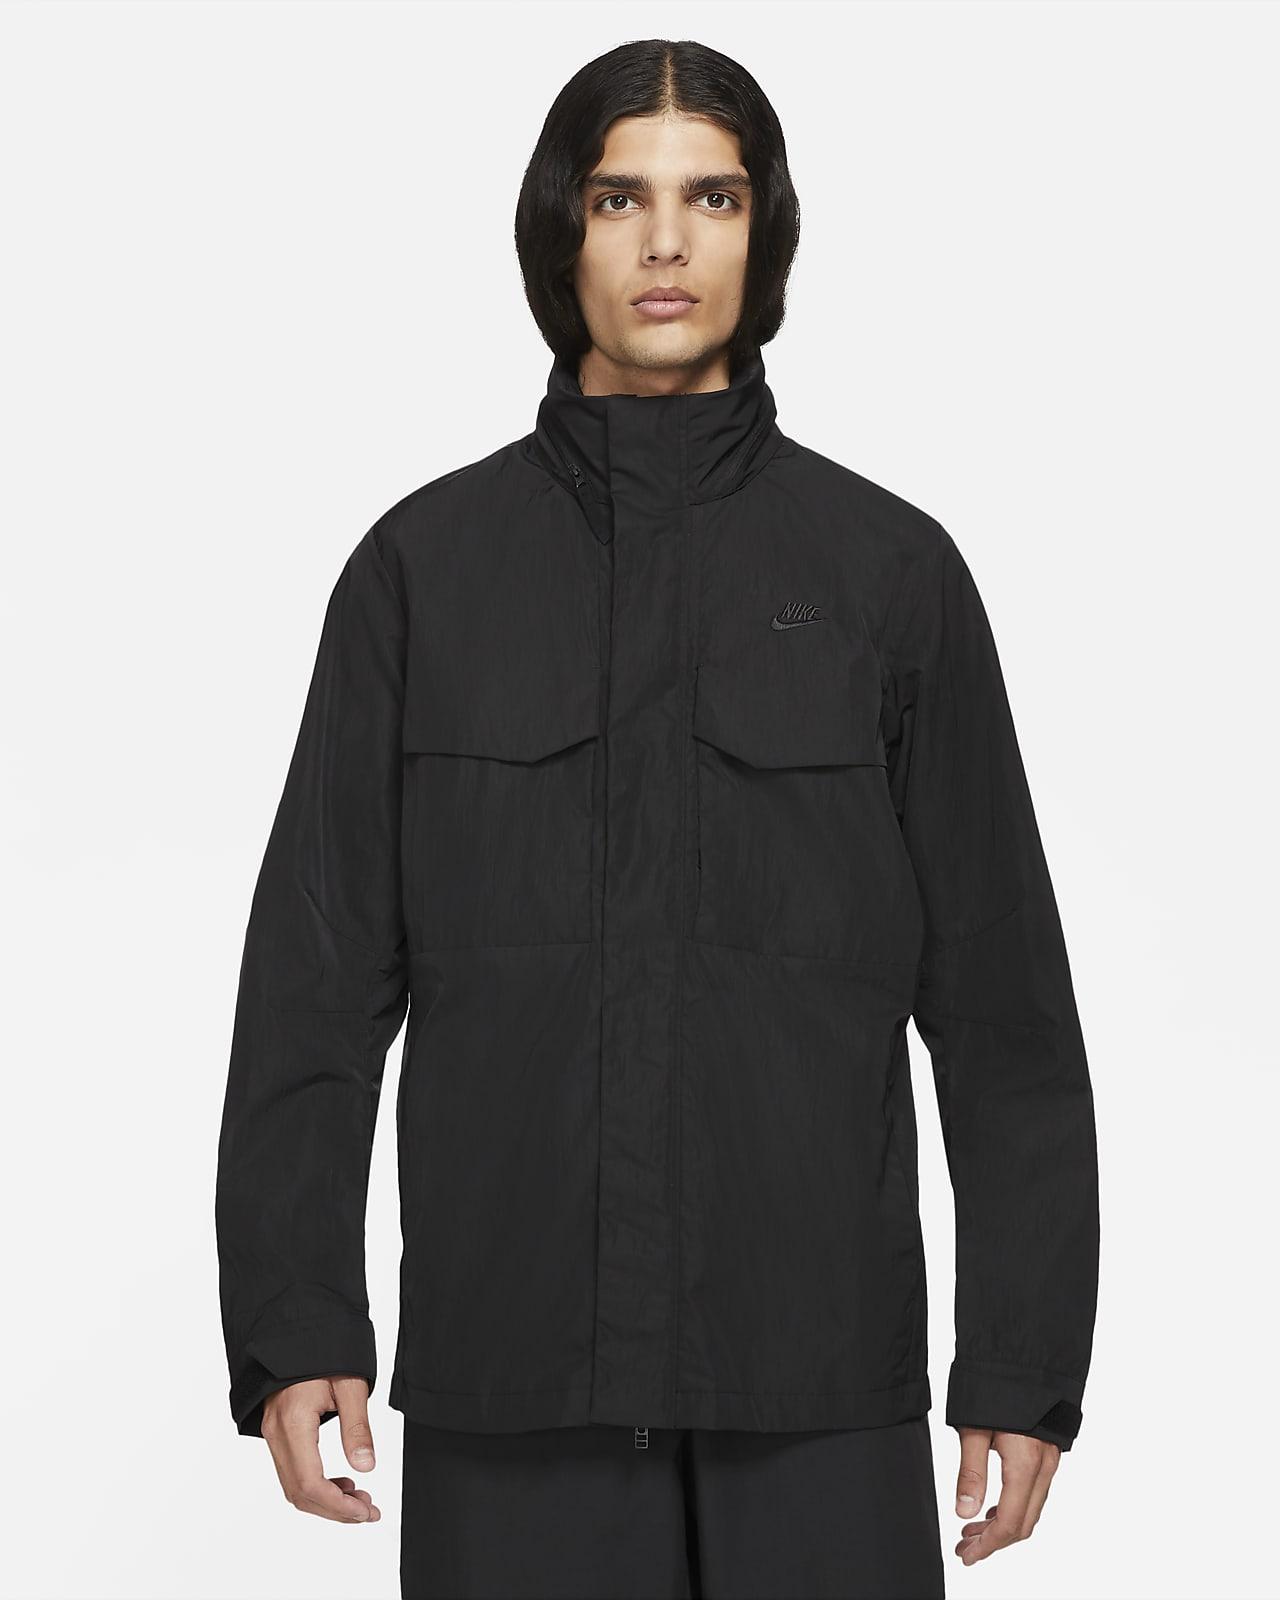 Мужская куртка M65 с капюшоном без подкладки Nike Sportswear Premium Essentials